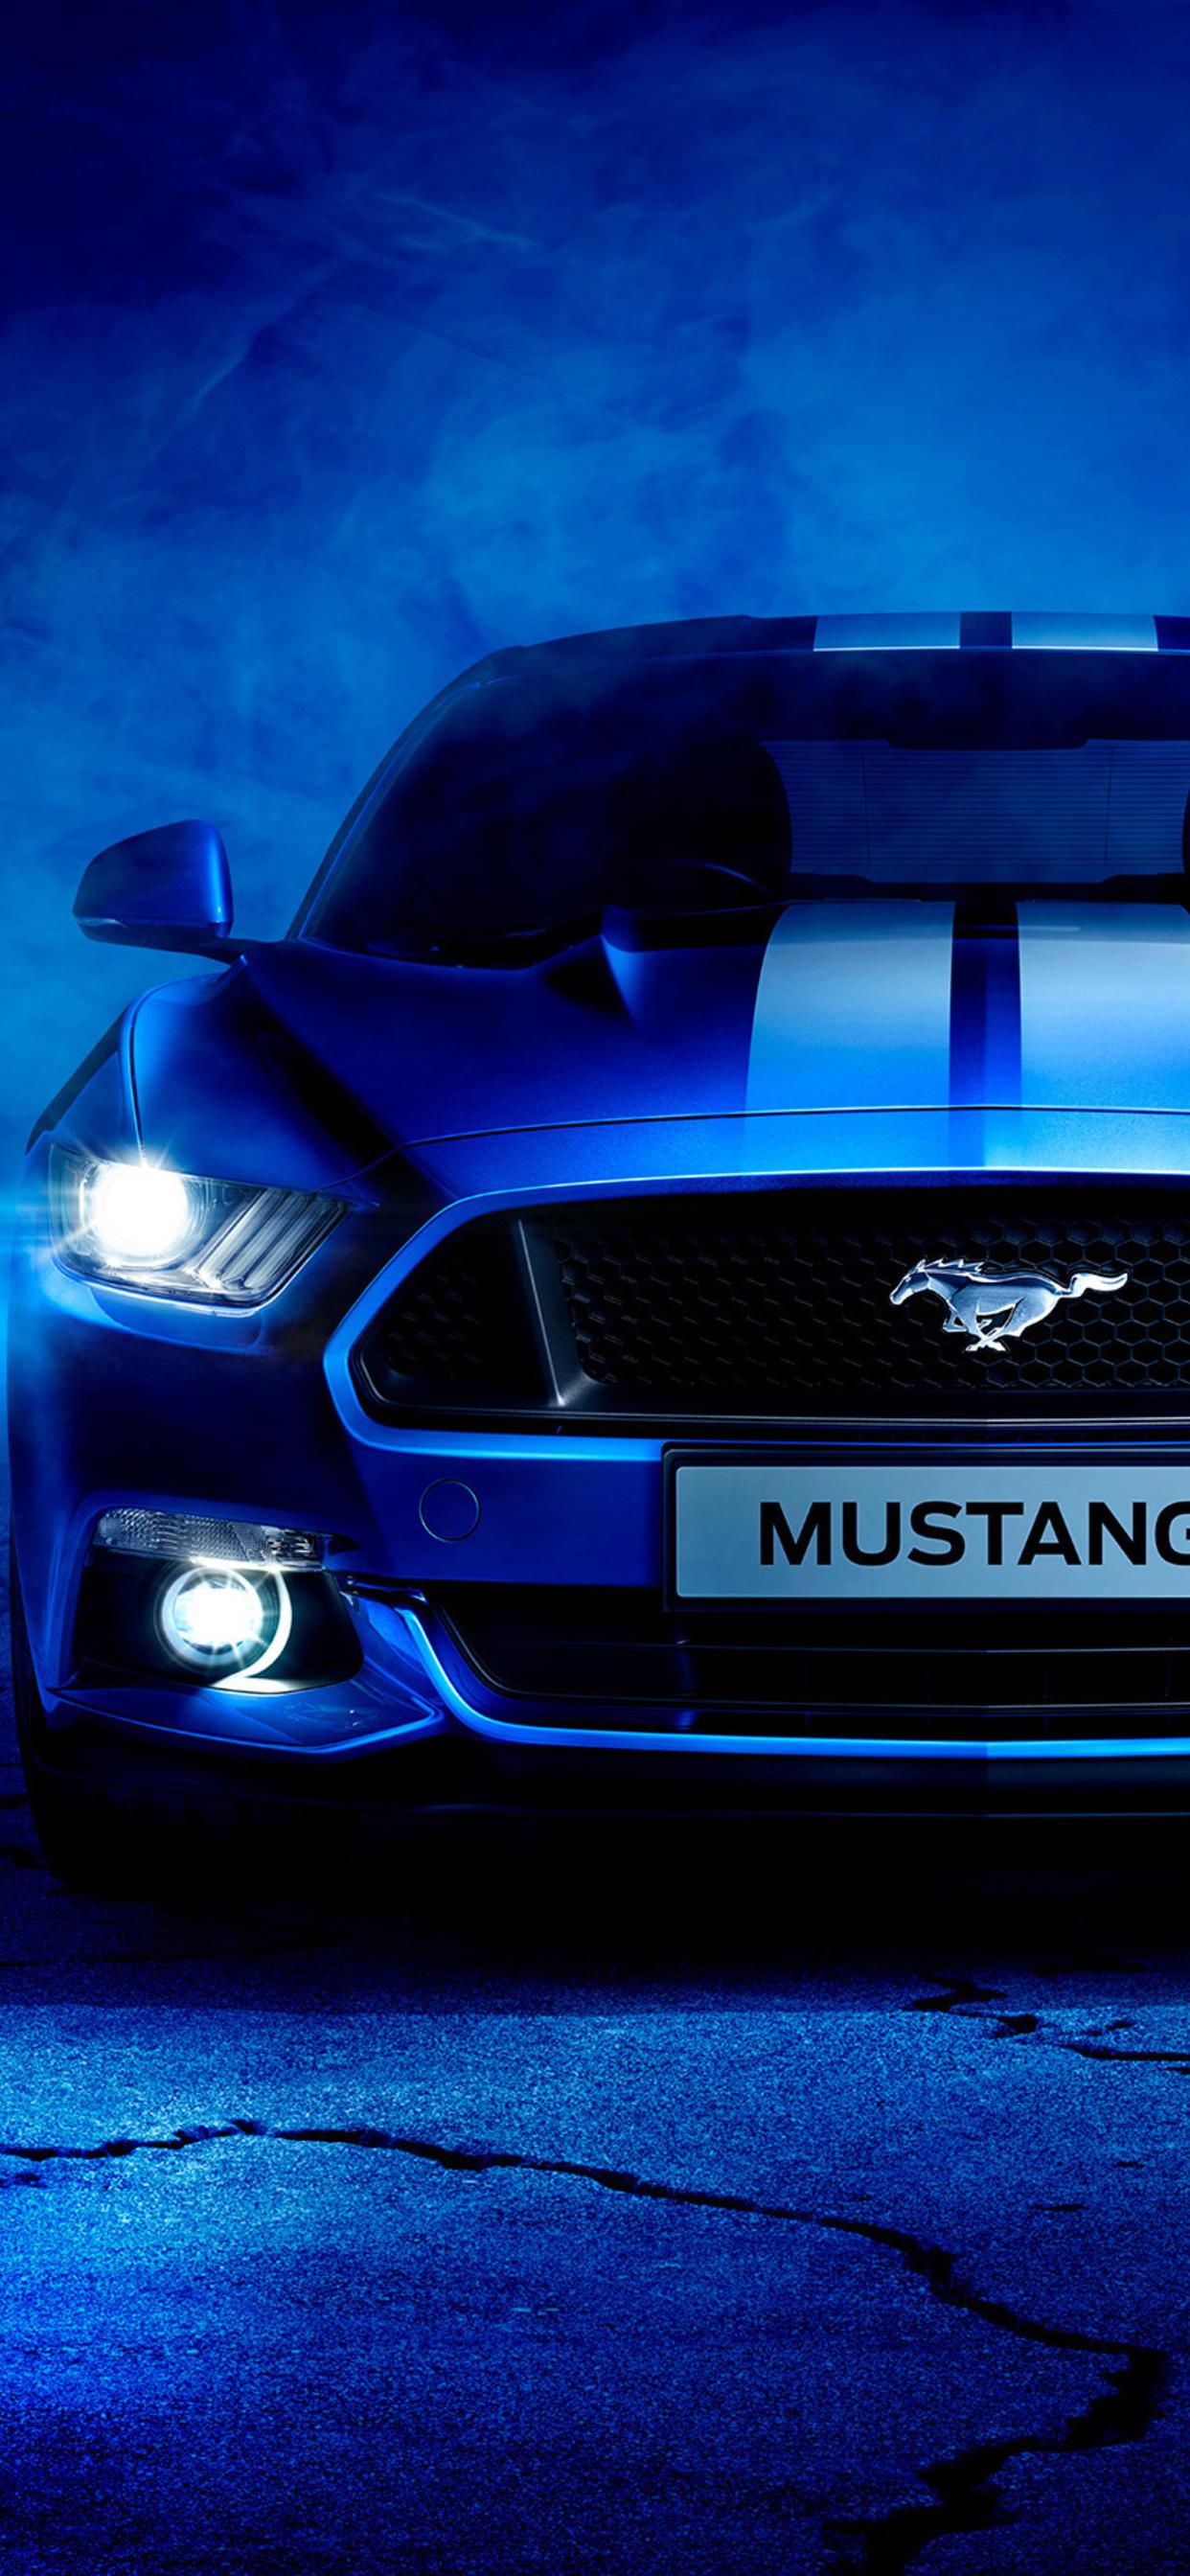 Mustang Hd Wallpaper For Iphone